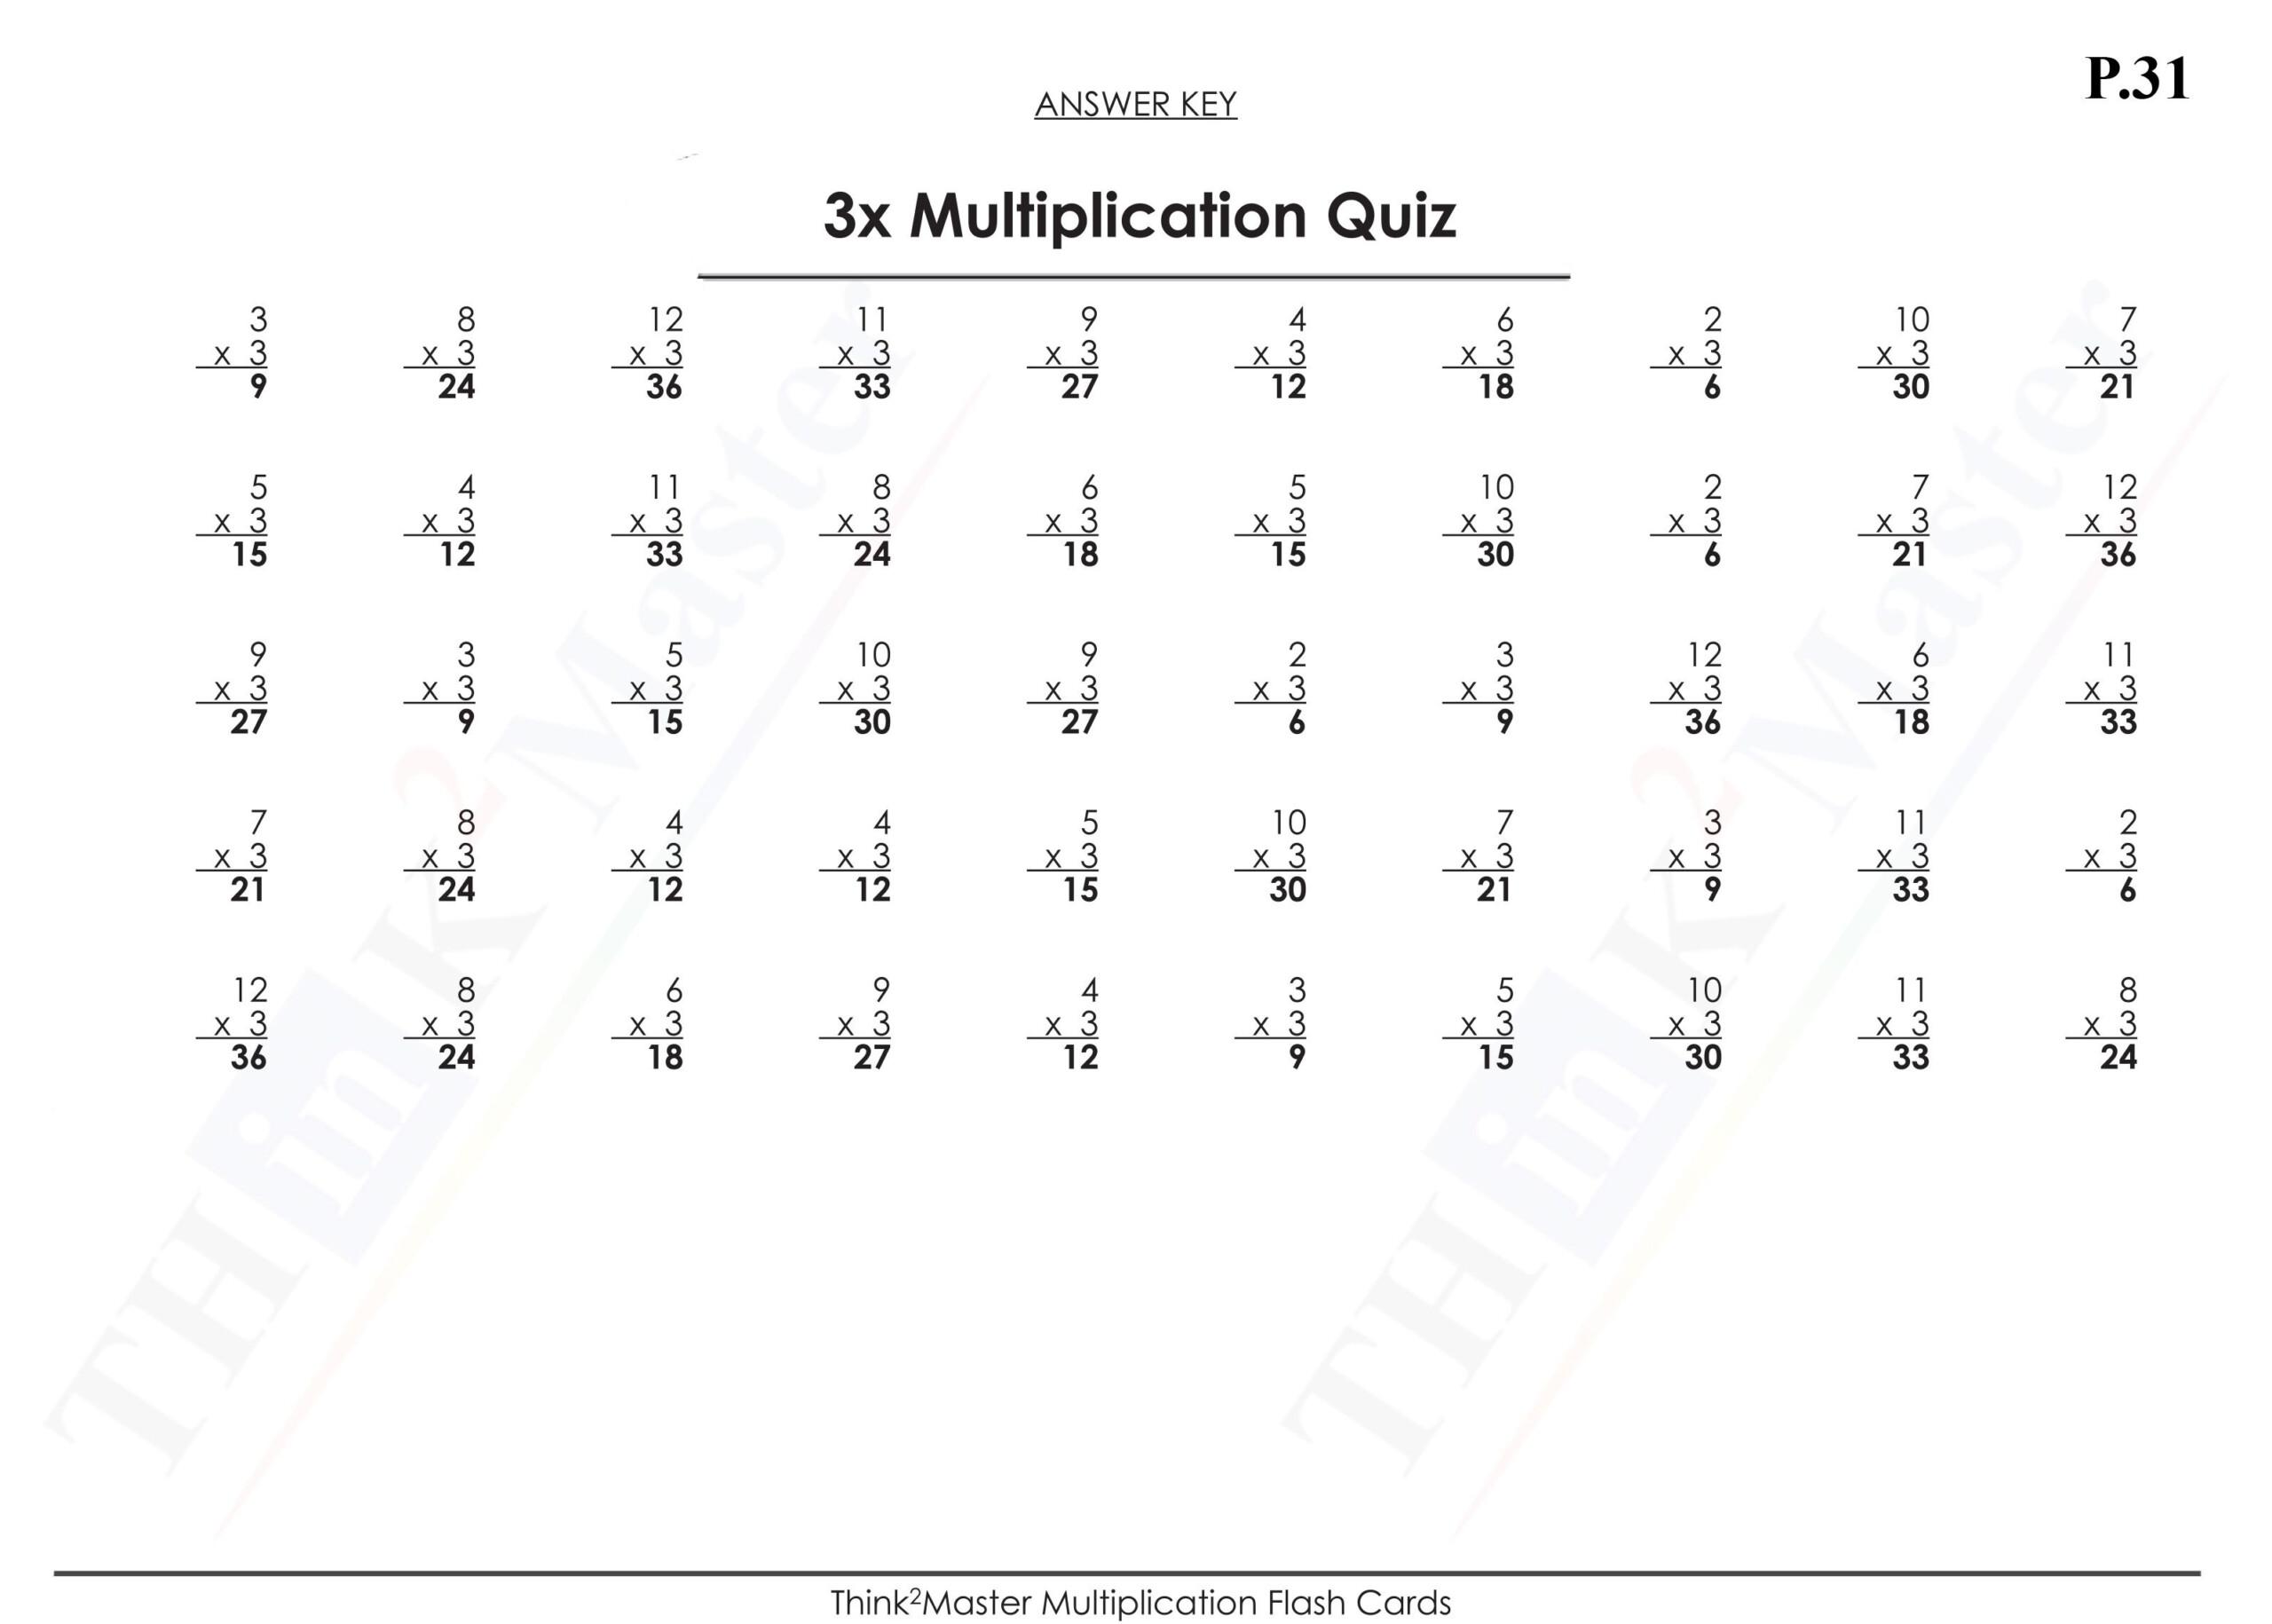 Free Printable 3X Multiplication Quiz Answers | Free intended for Printable Multiplication Flash Cards 1-15